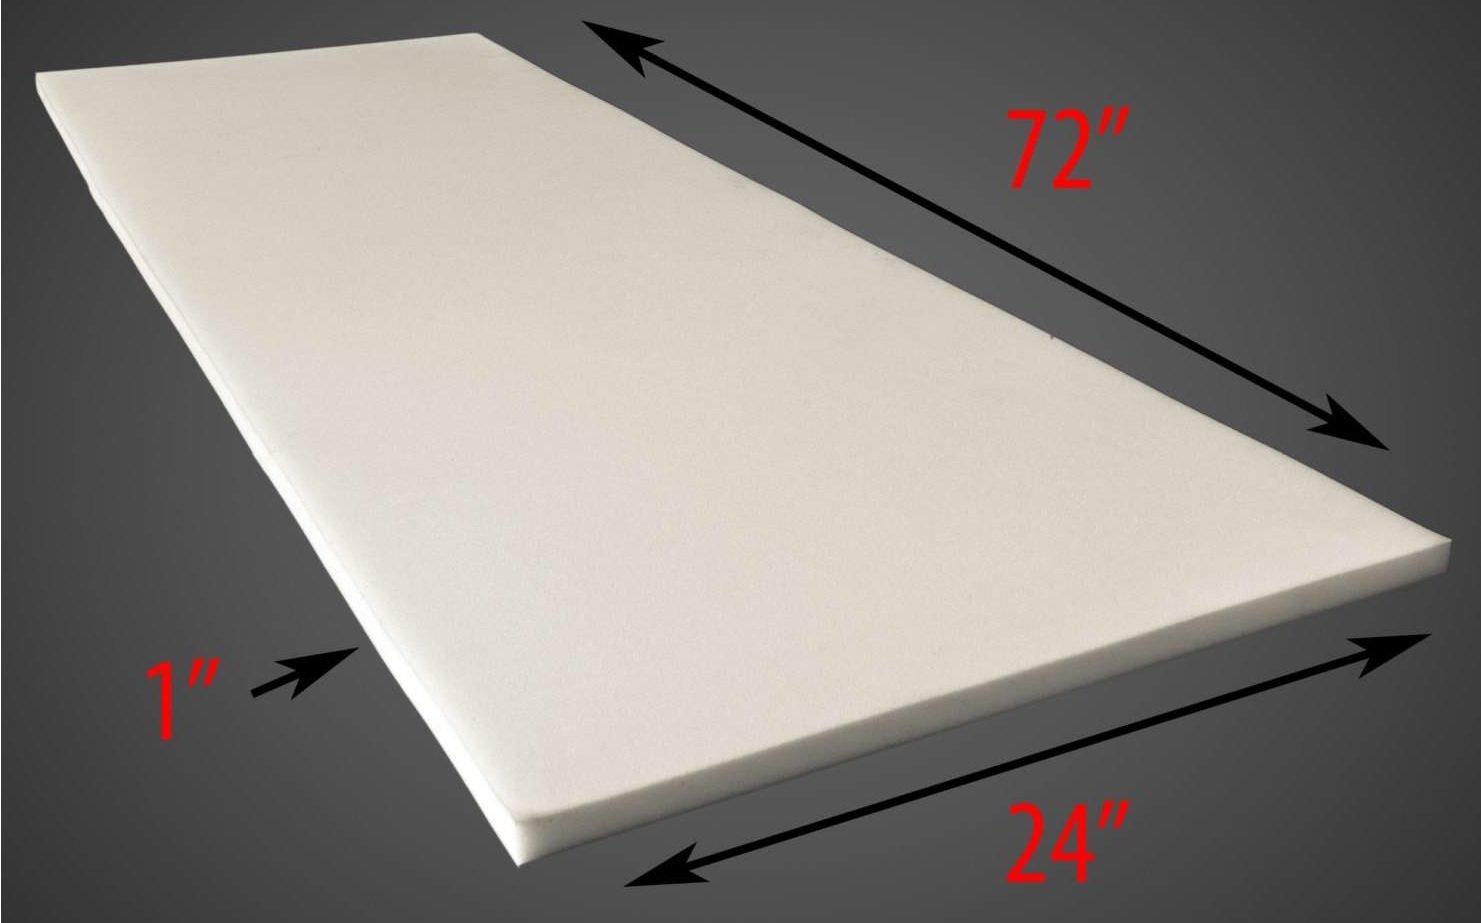 1'' X 24'' X 72'' Upholstery Foam Cushion (Seat Replacement , Upholstery Sheet , Foam Padding) by luvfabrics